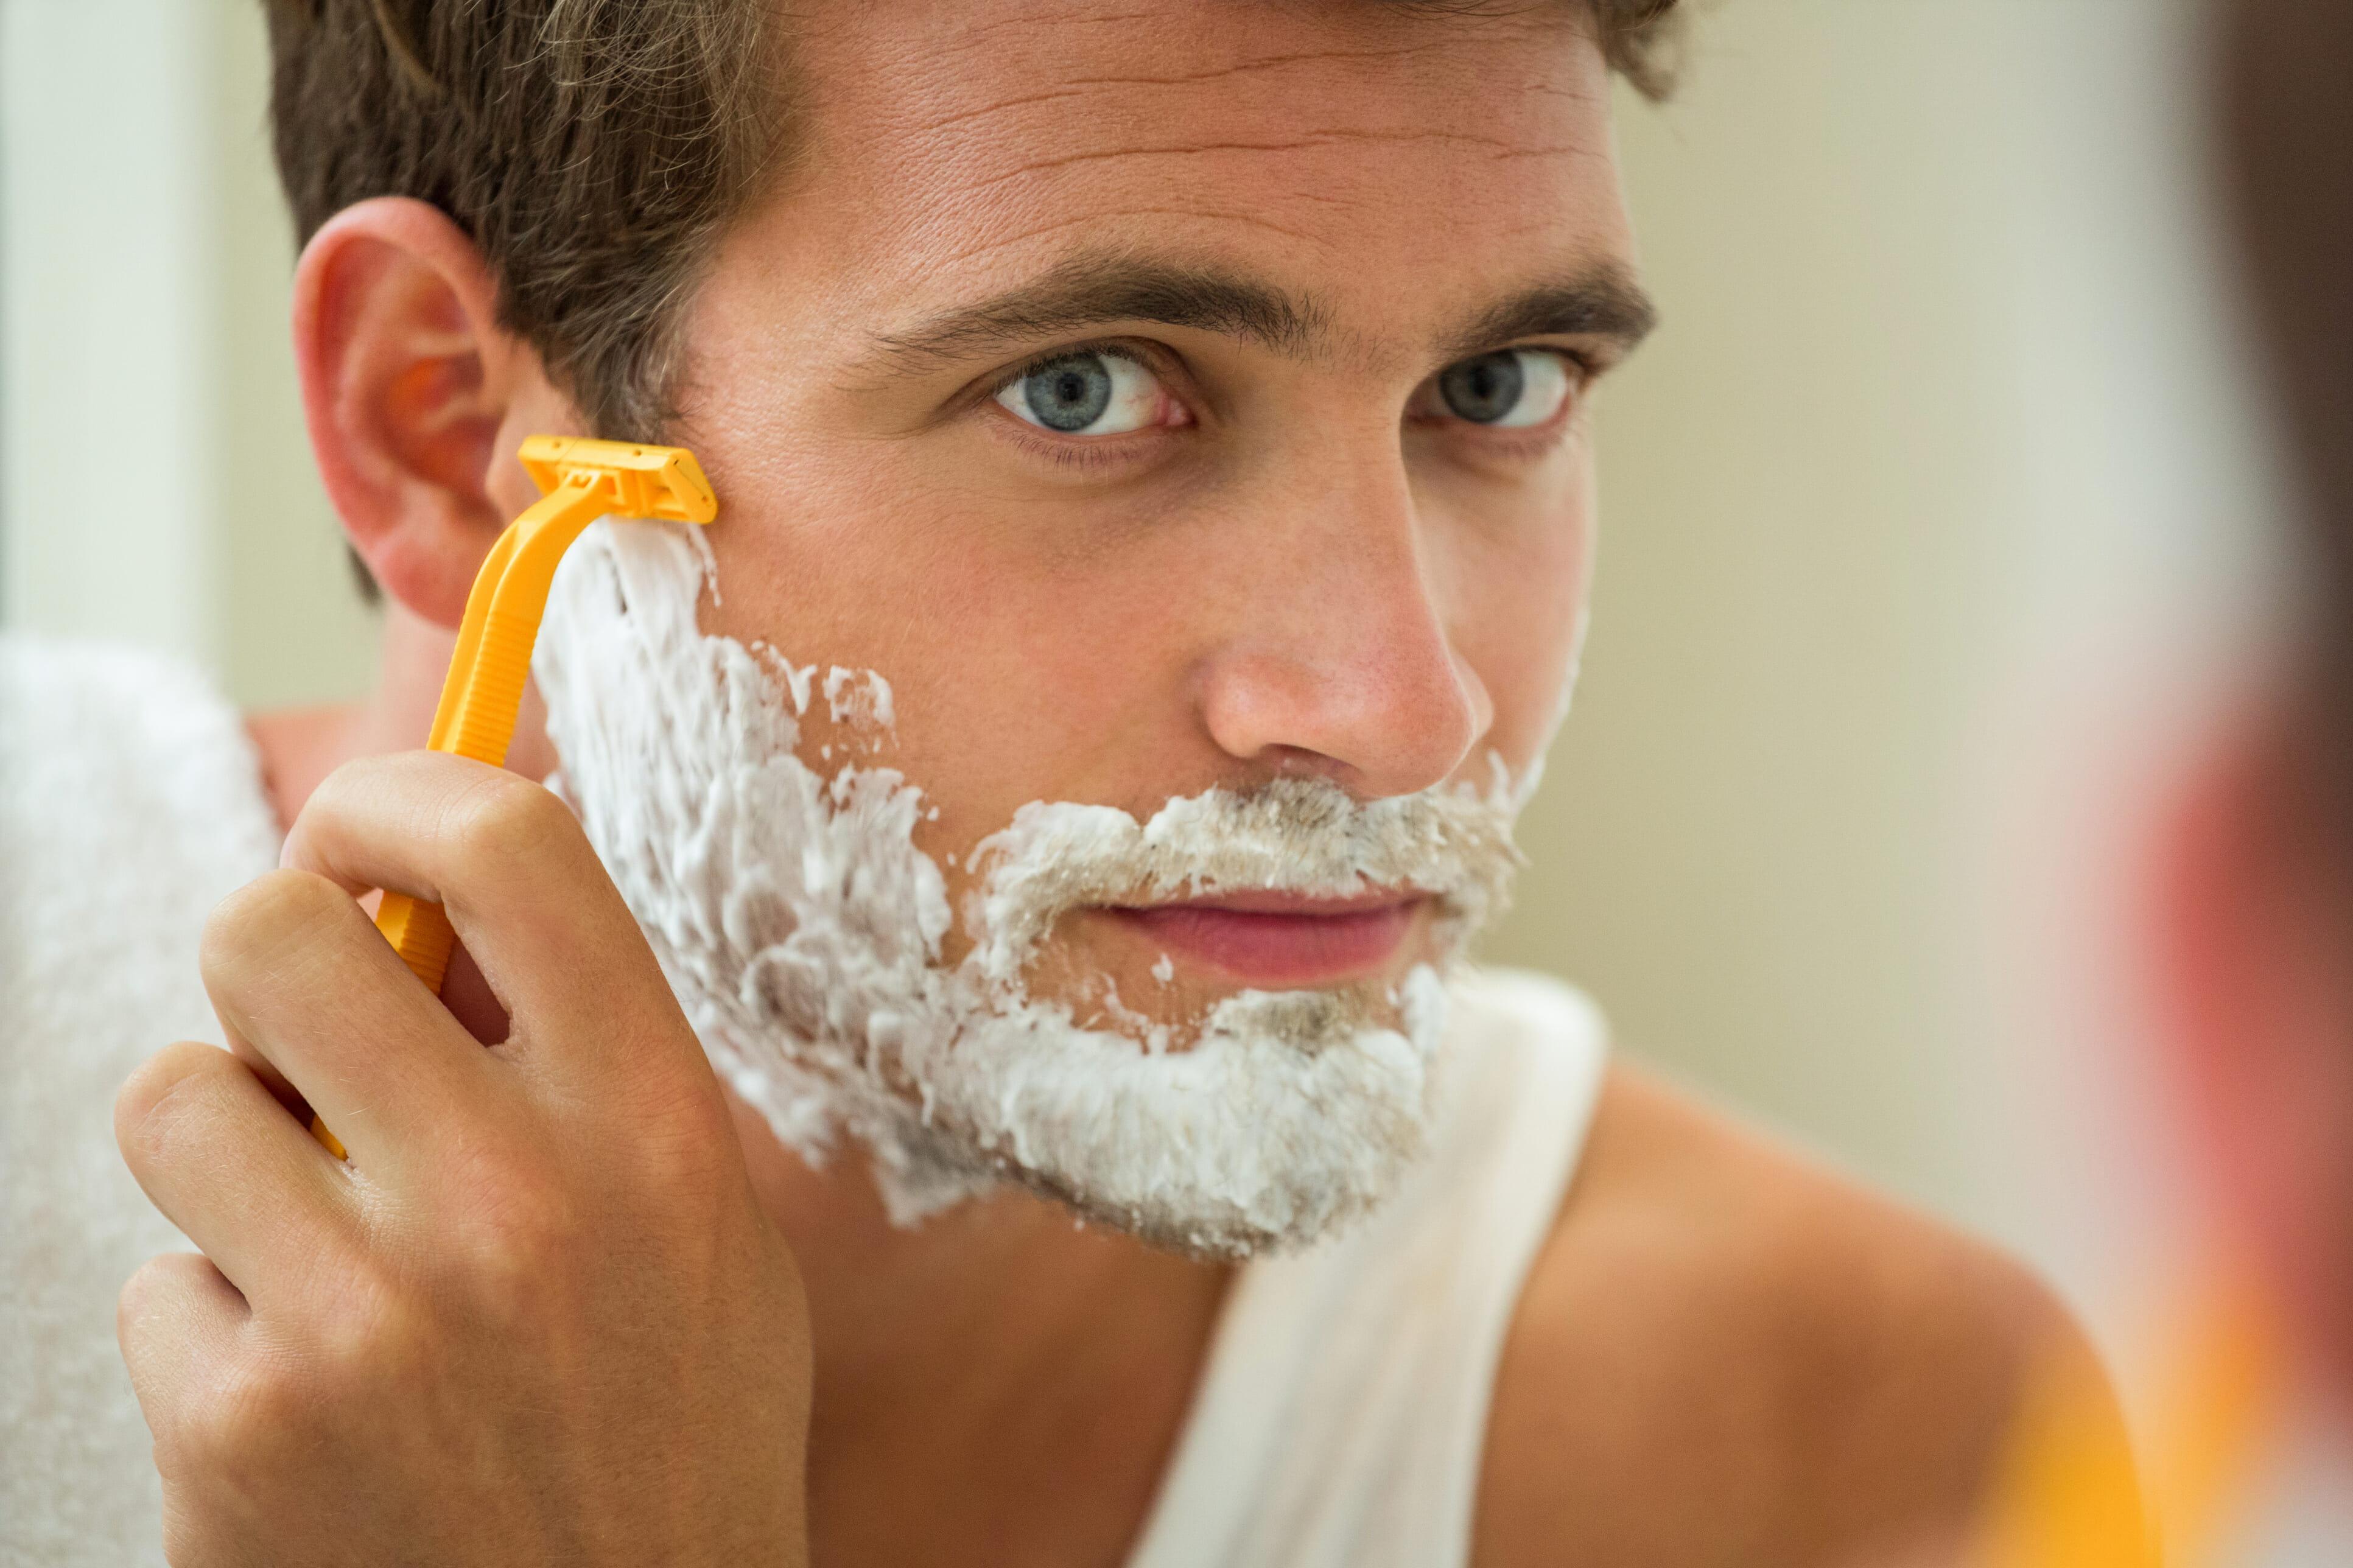 Australian men are spending more on looking good